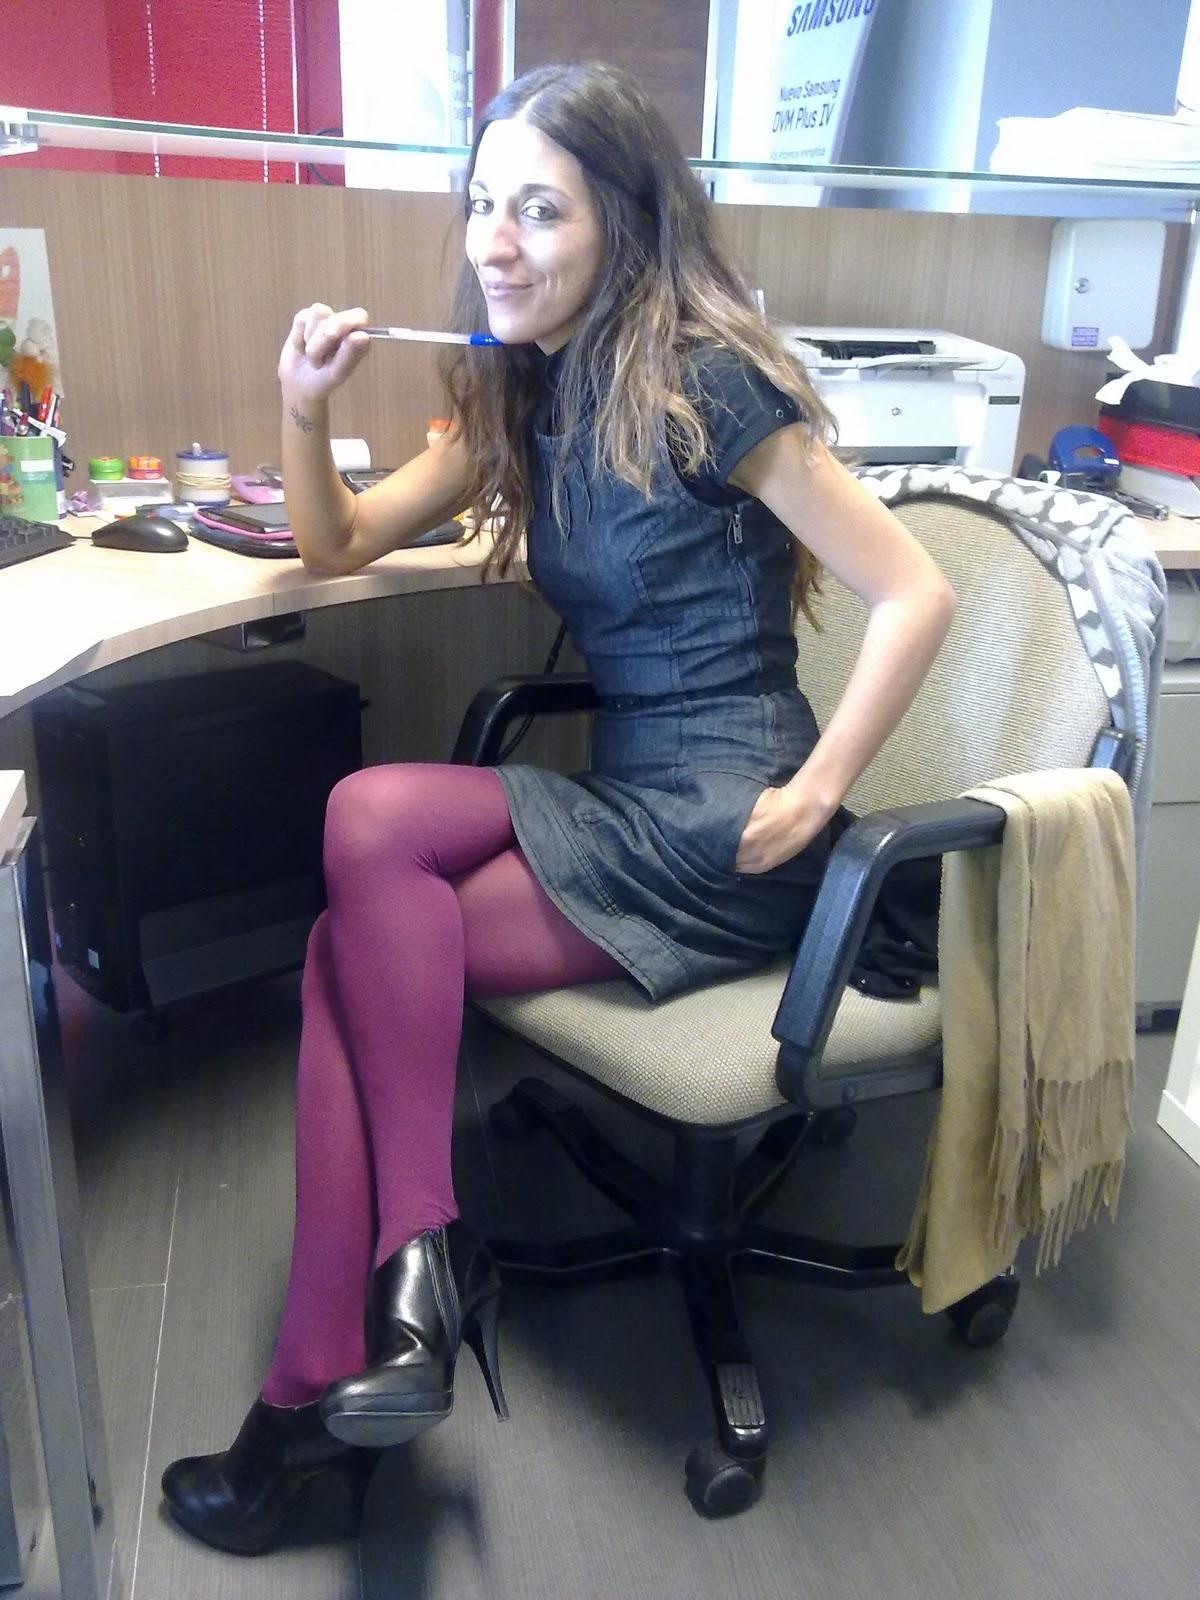 Con un par de armarios chicas de oficina for Oficinas chicas